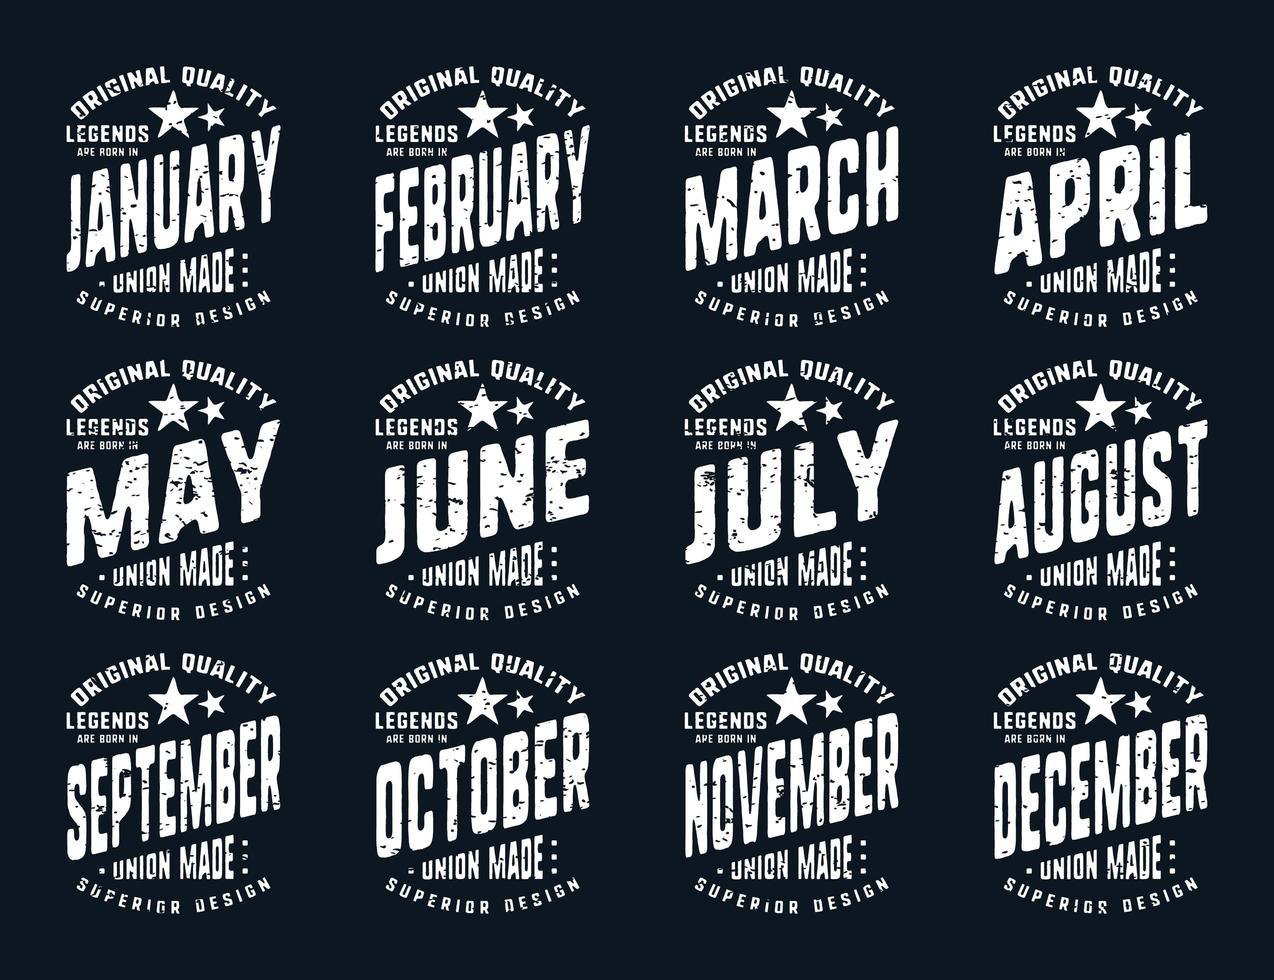 leggende del grunge sono nate vari mesi di tipografia t-shirt vintage vettore